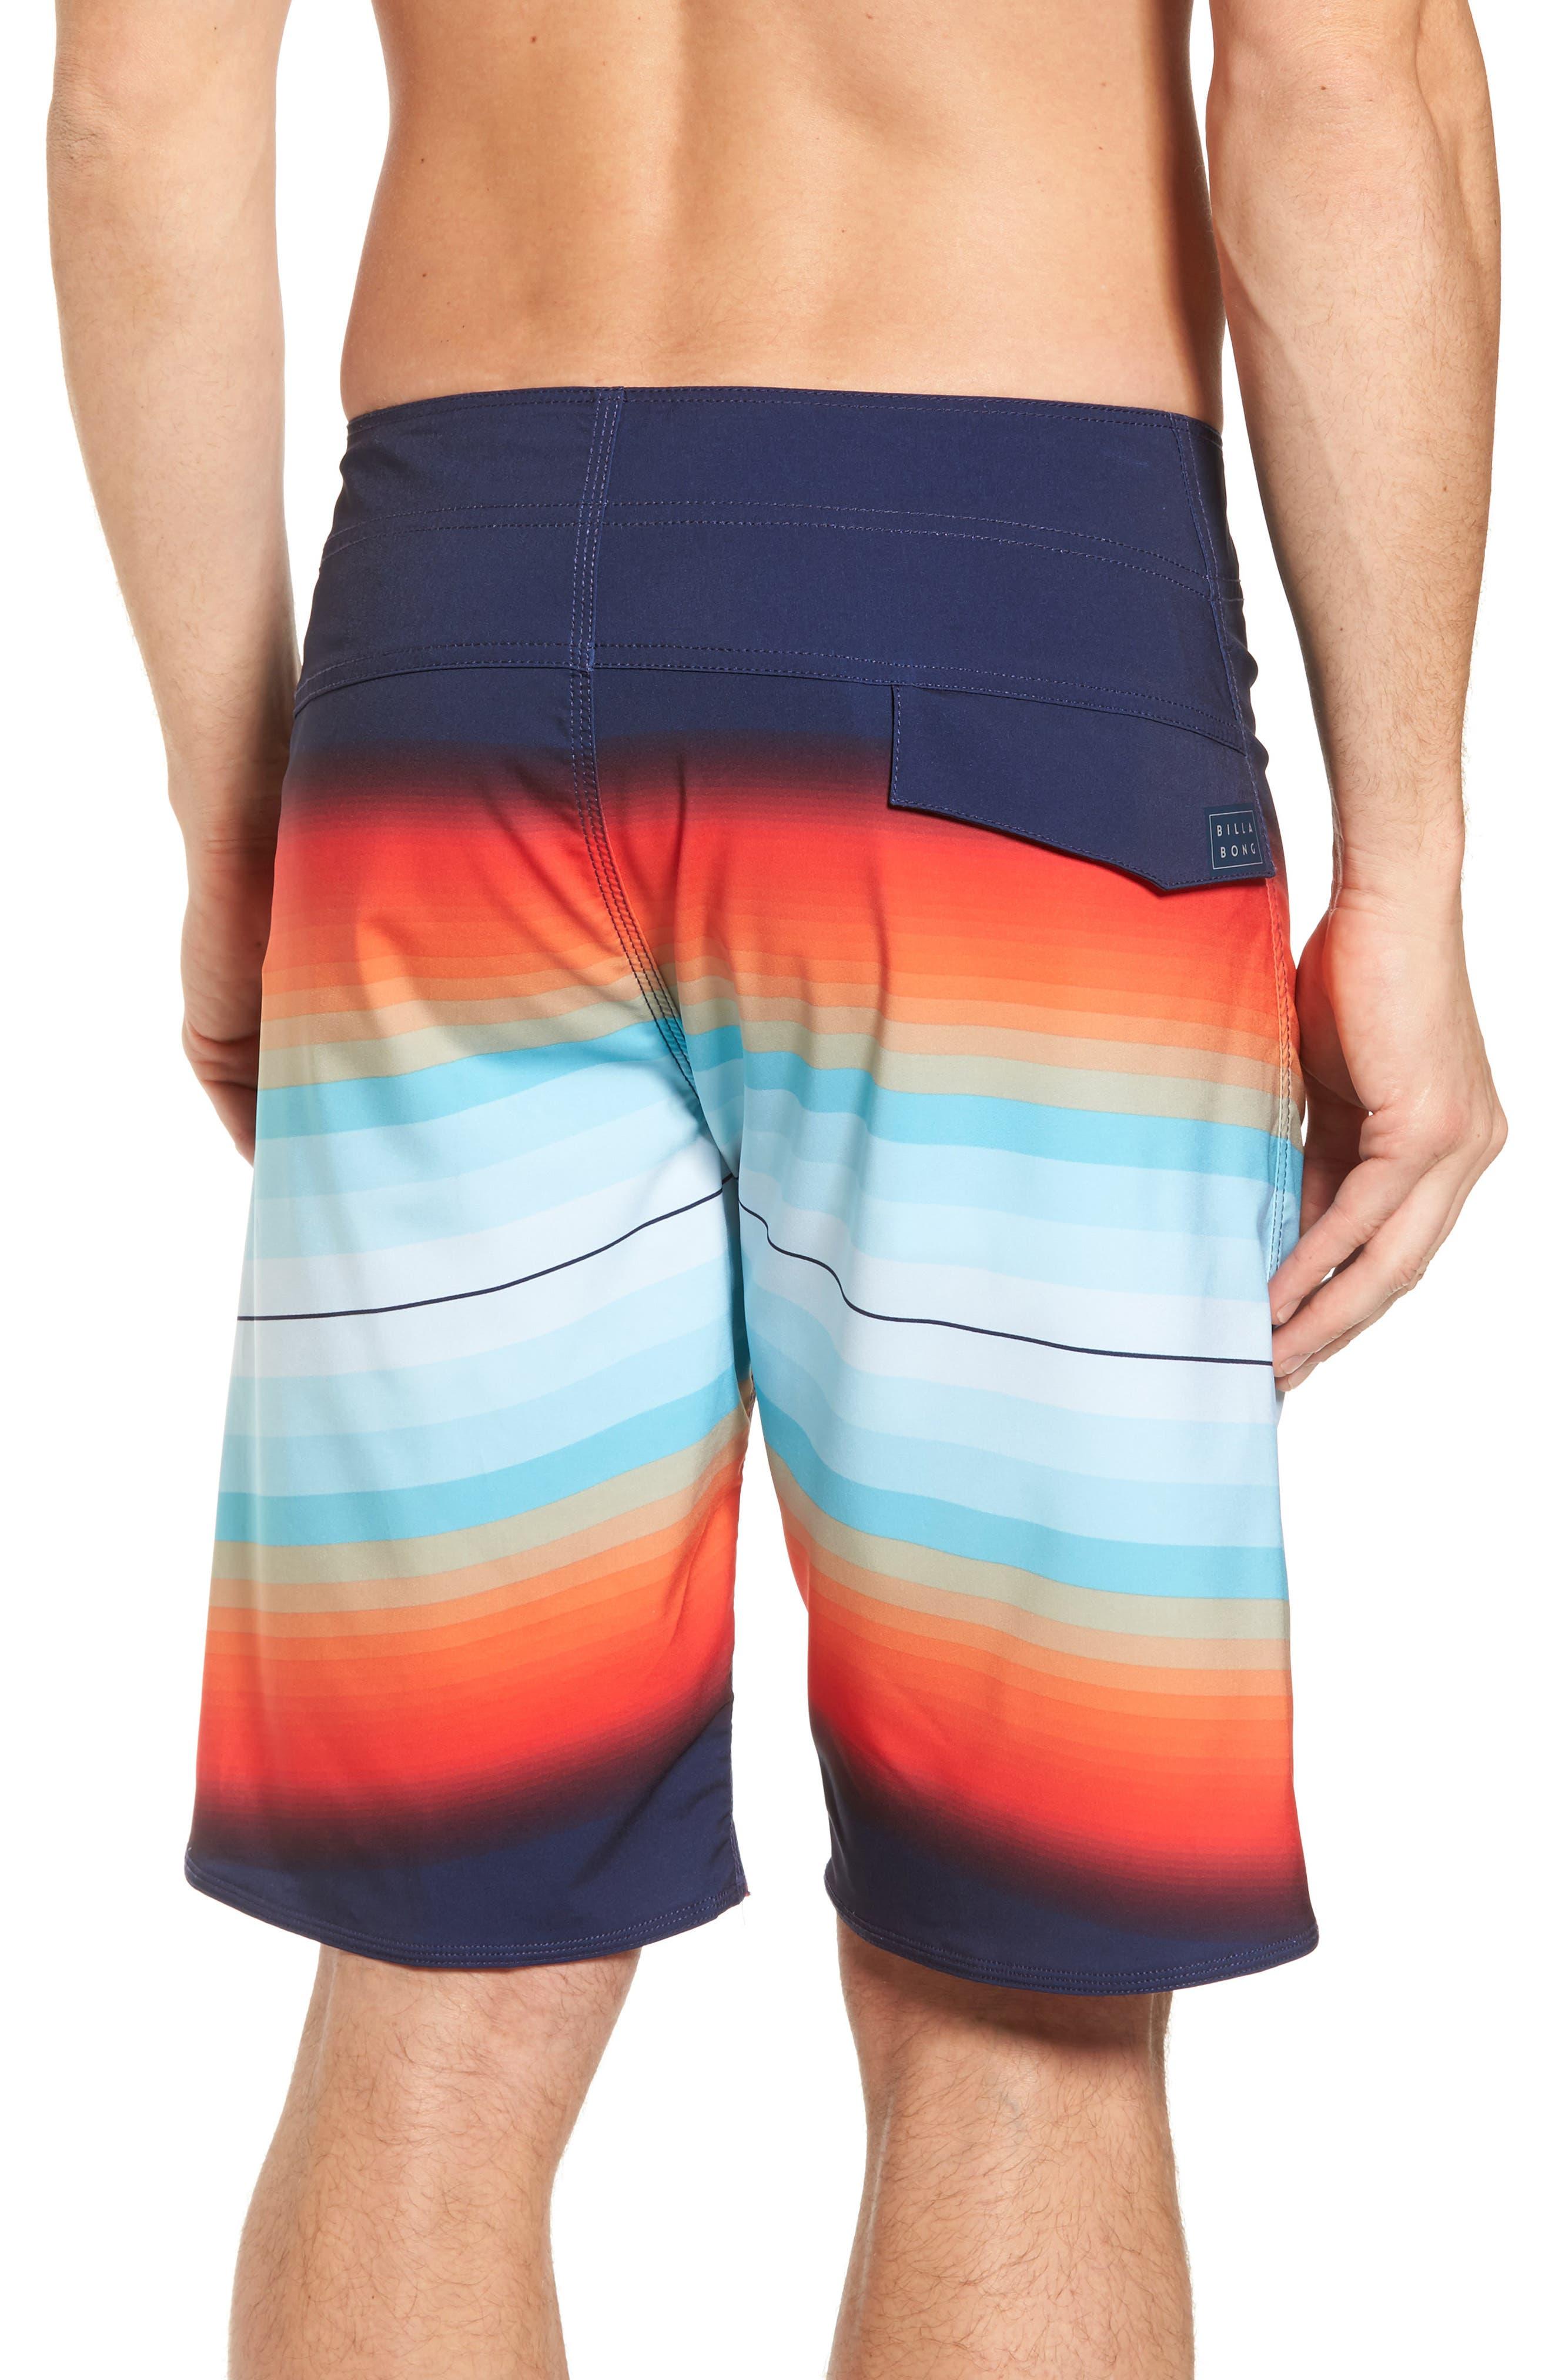 Fluid X Board Shorts,                             Alternate thumbnail 6, color,